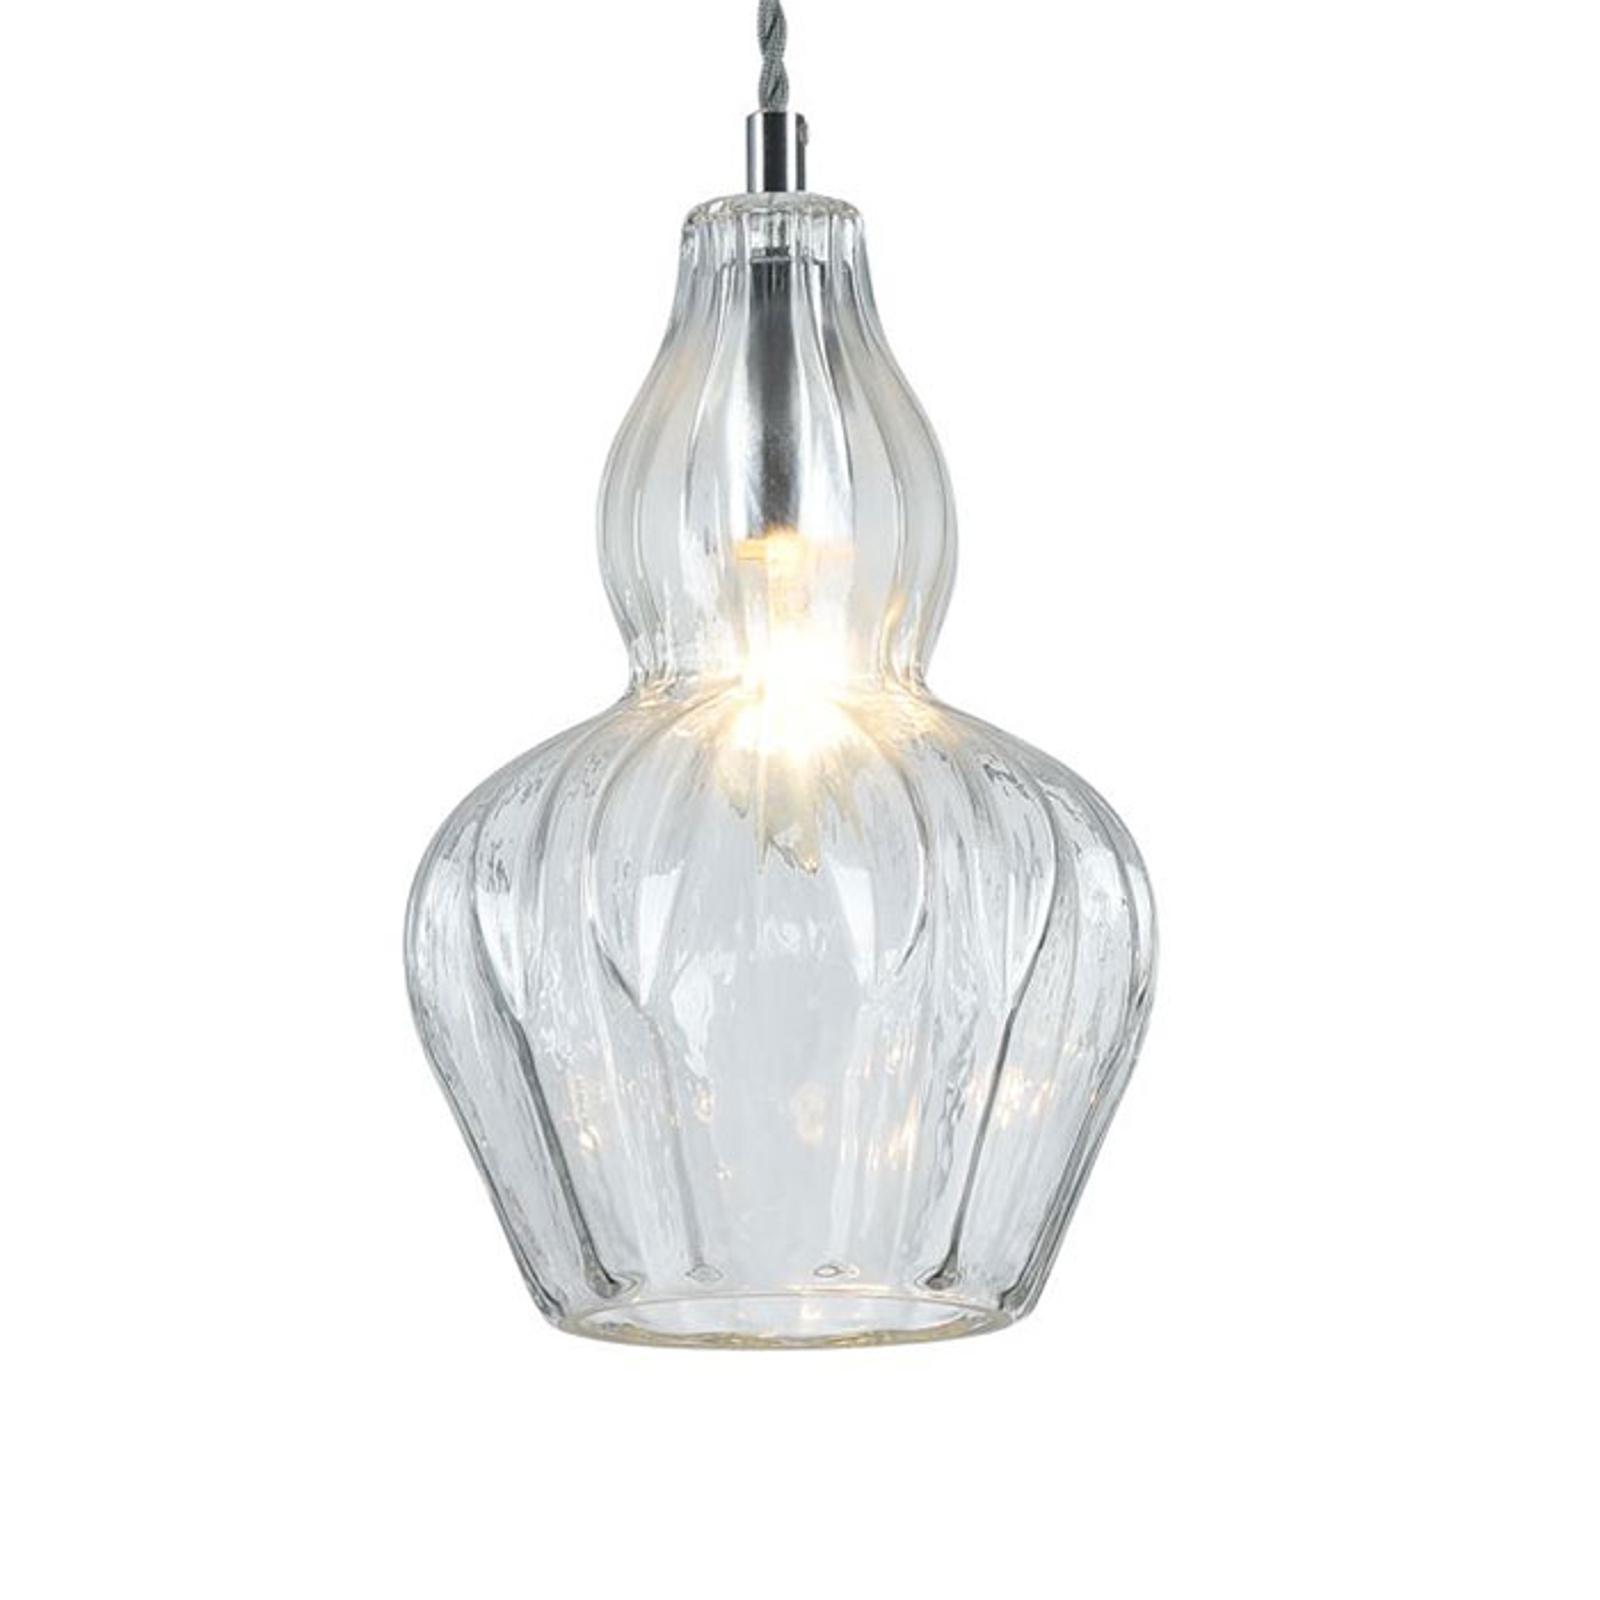 Hanglamp Eustoma met helder glas